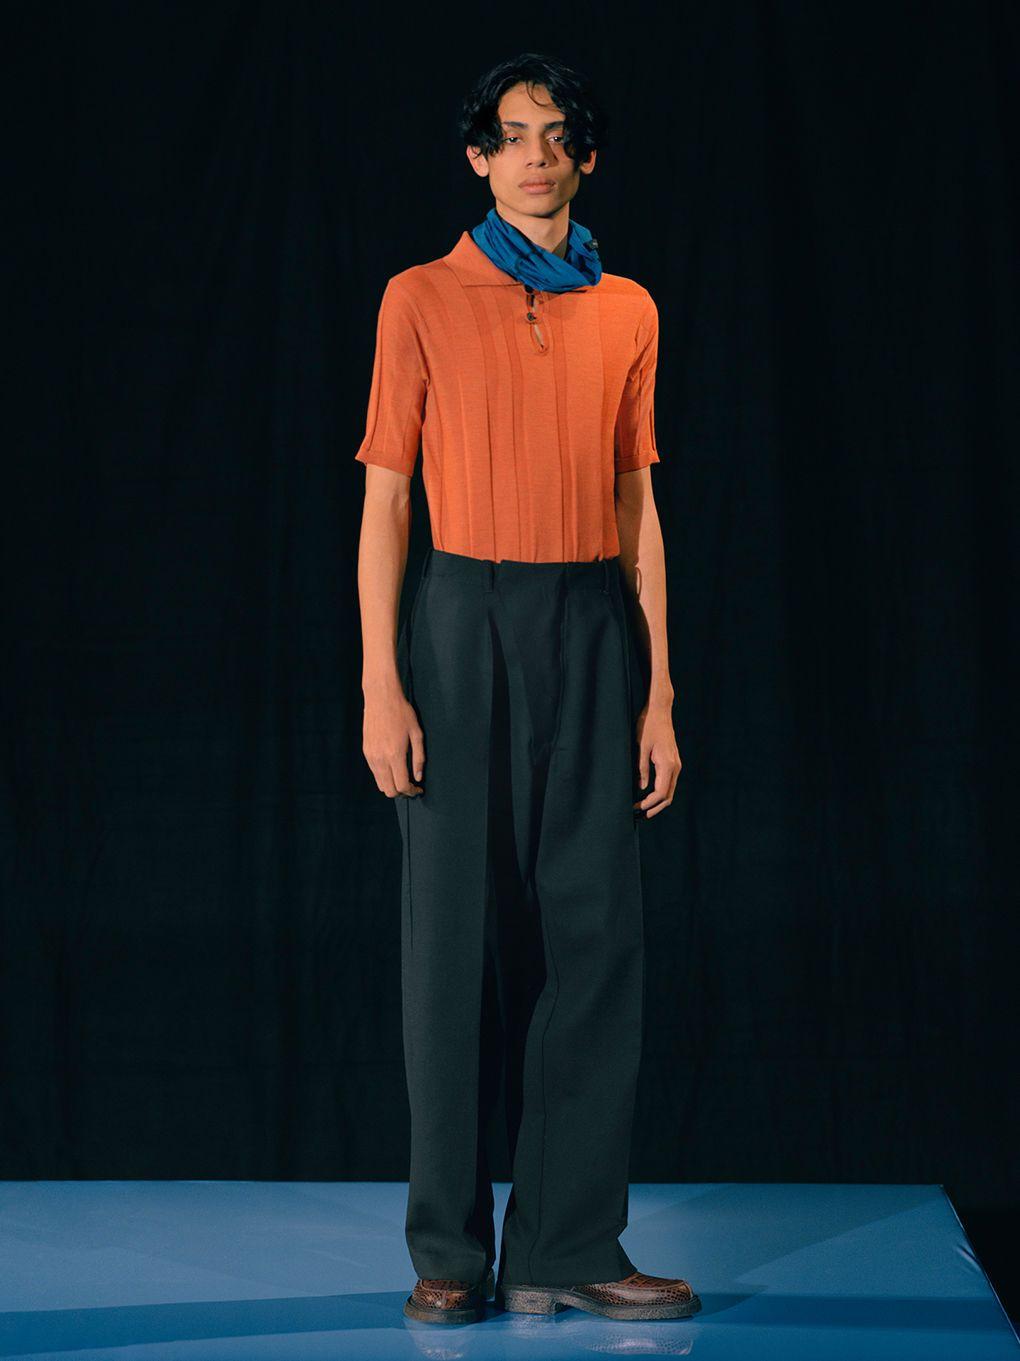 MACKINTOSH 0003 | The Clothes He Wears | Fashion, Style inspiration